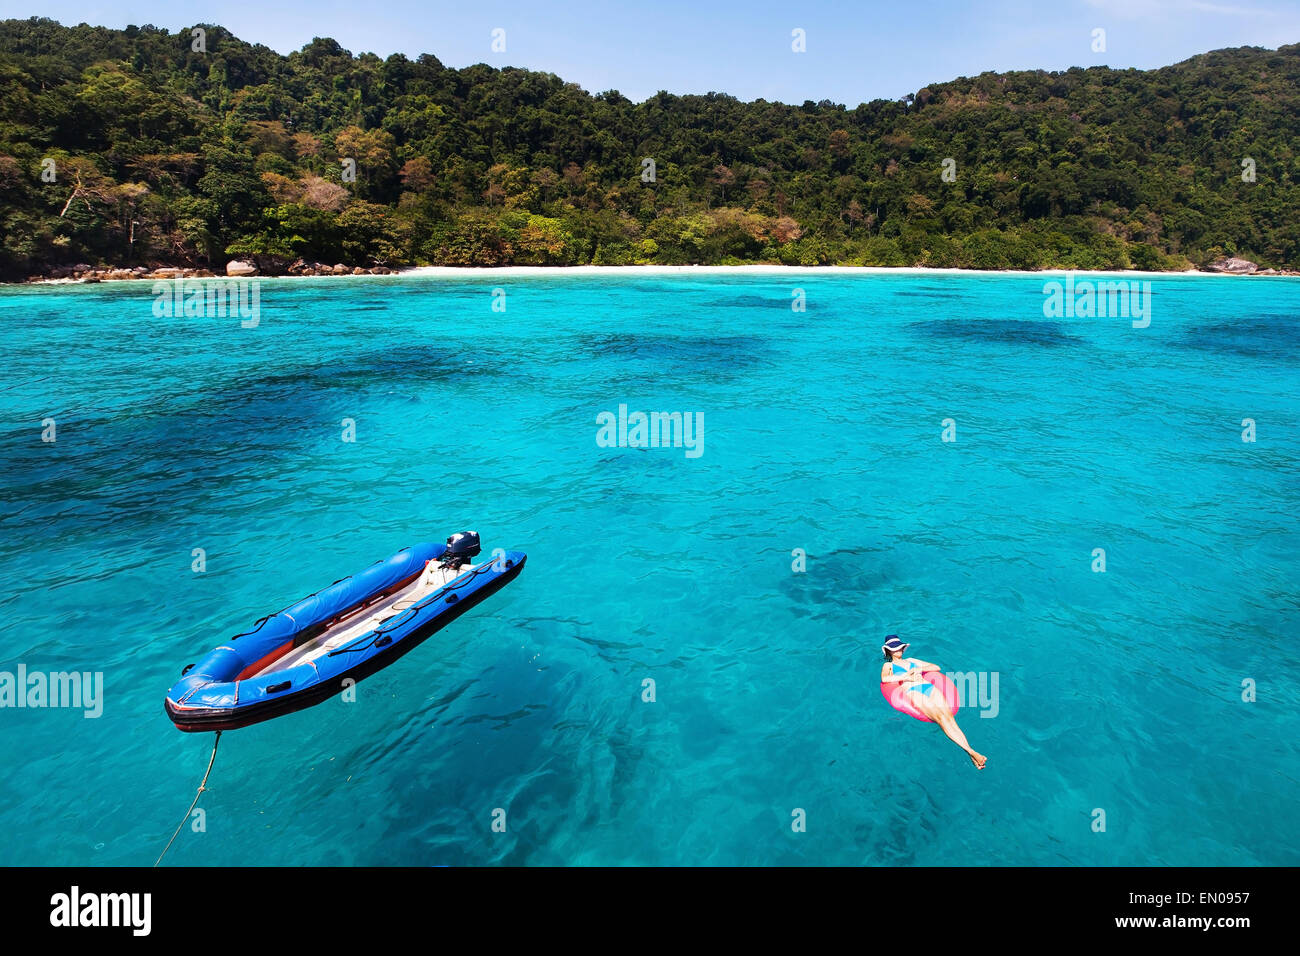 Frau im Bikini entspannend am türkisblauen Strand, Draufsicht Stockbild